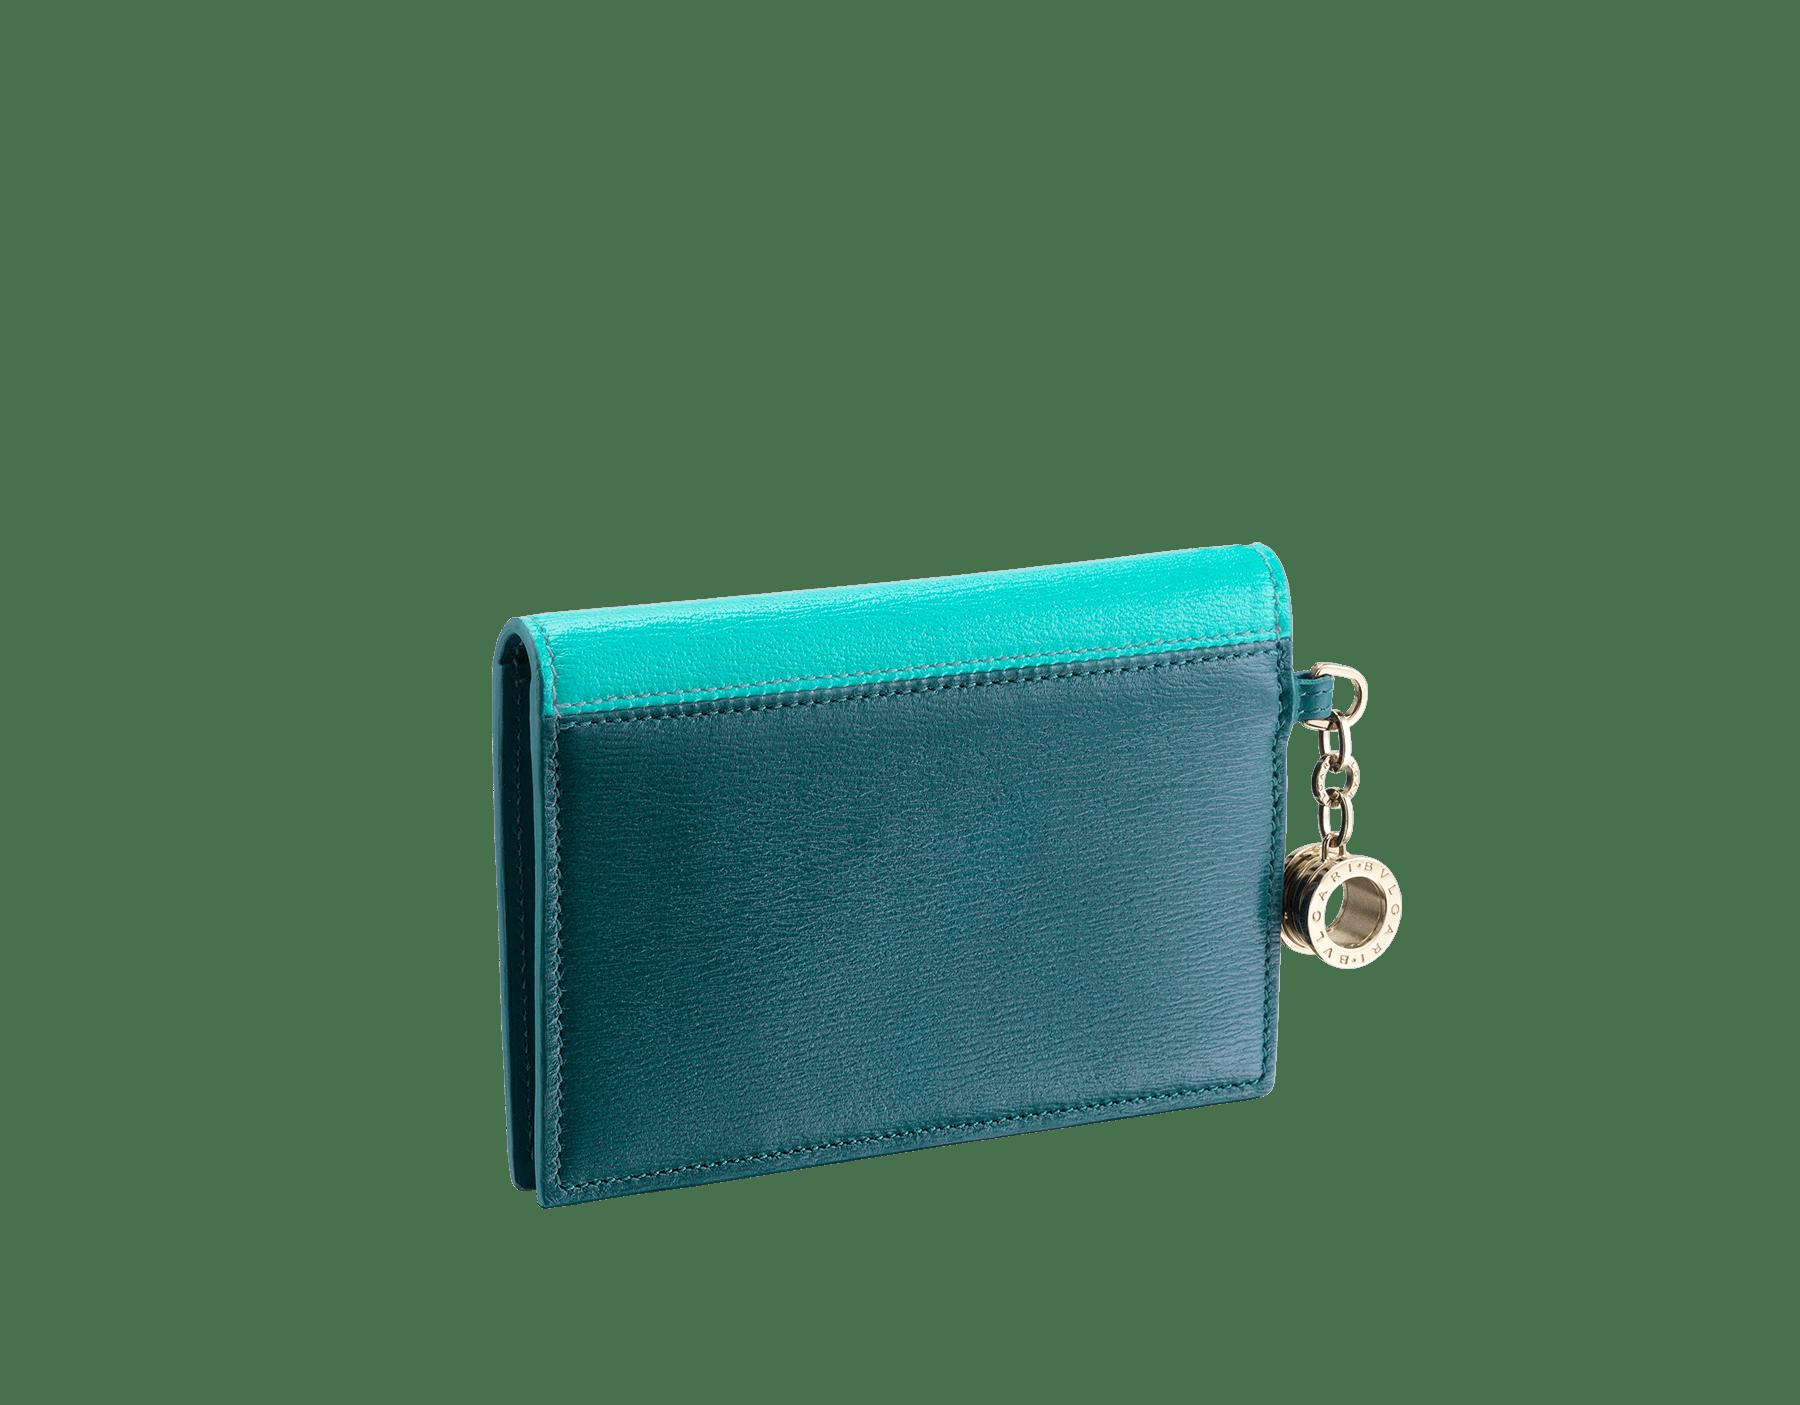 B.Zero1 熱帶綠松石色和深綠玉色羊皮折式信用卡夾。經典 B.Zero1 淡金色黃銅吊飾。 288238 image 3